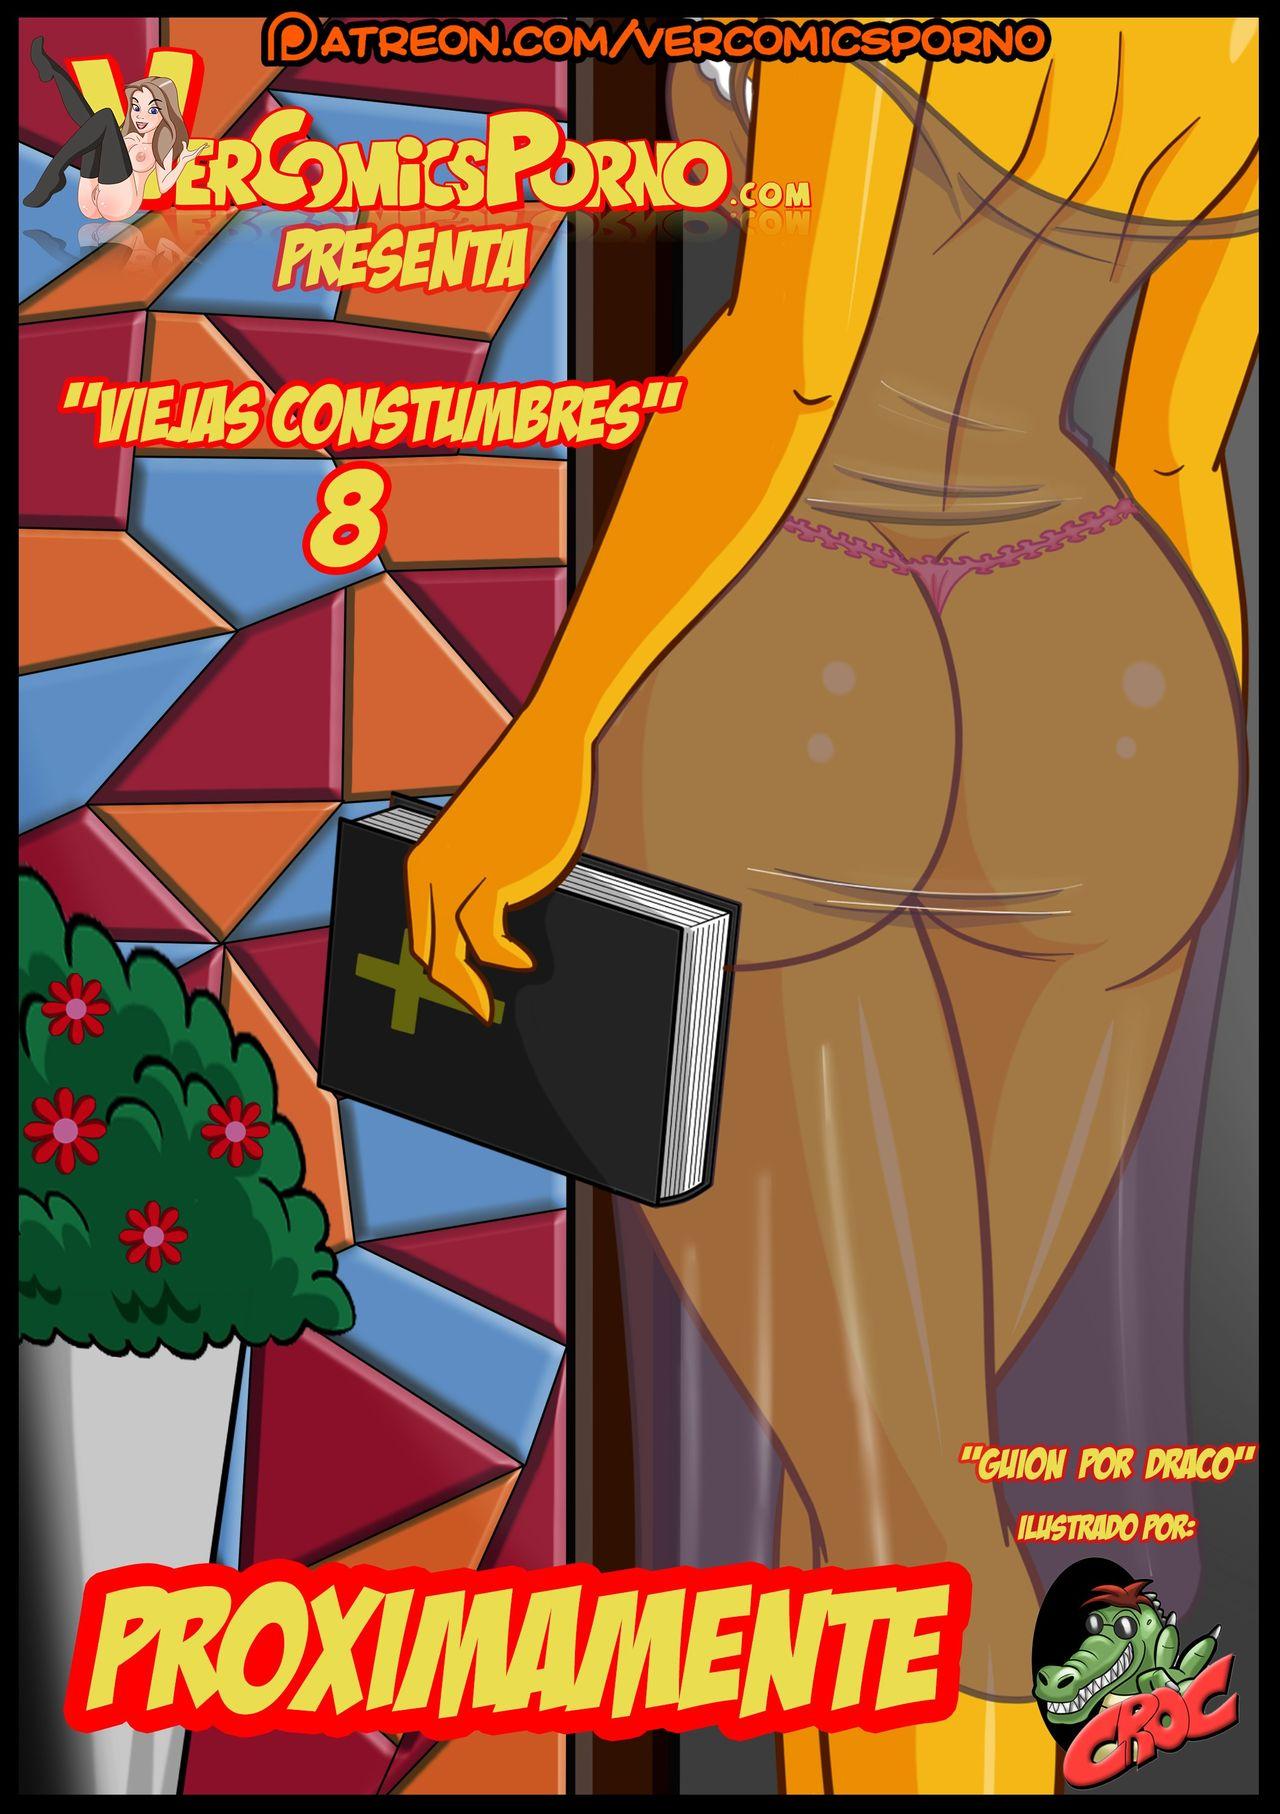 3D Porno Simpson old habits 8 – the simpsons parody sex comicscroc – porn